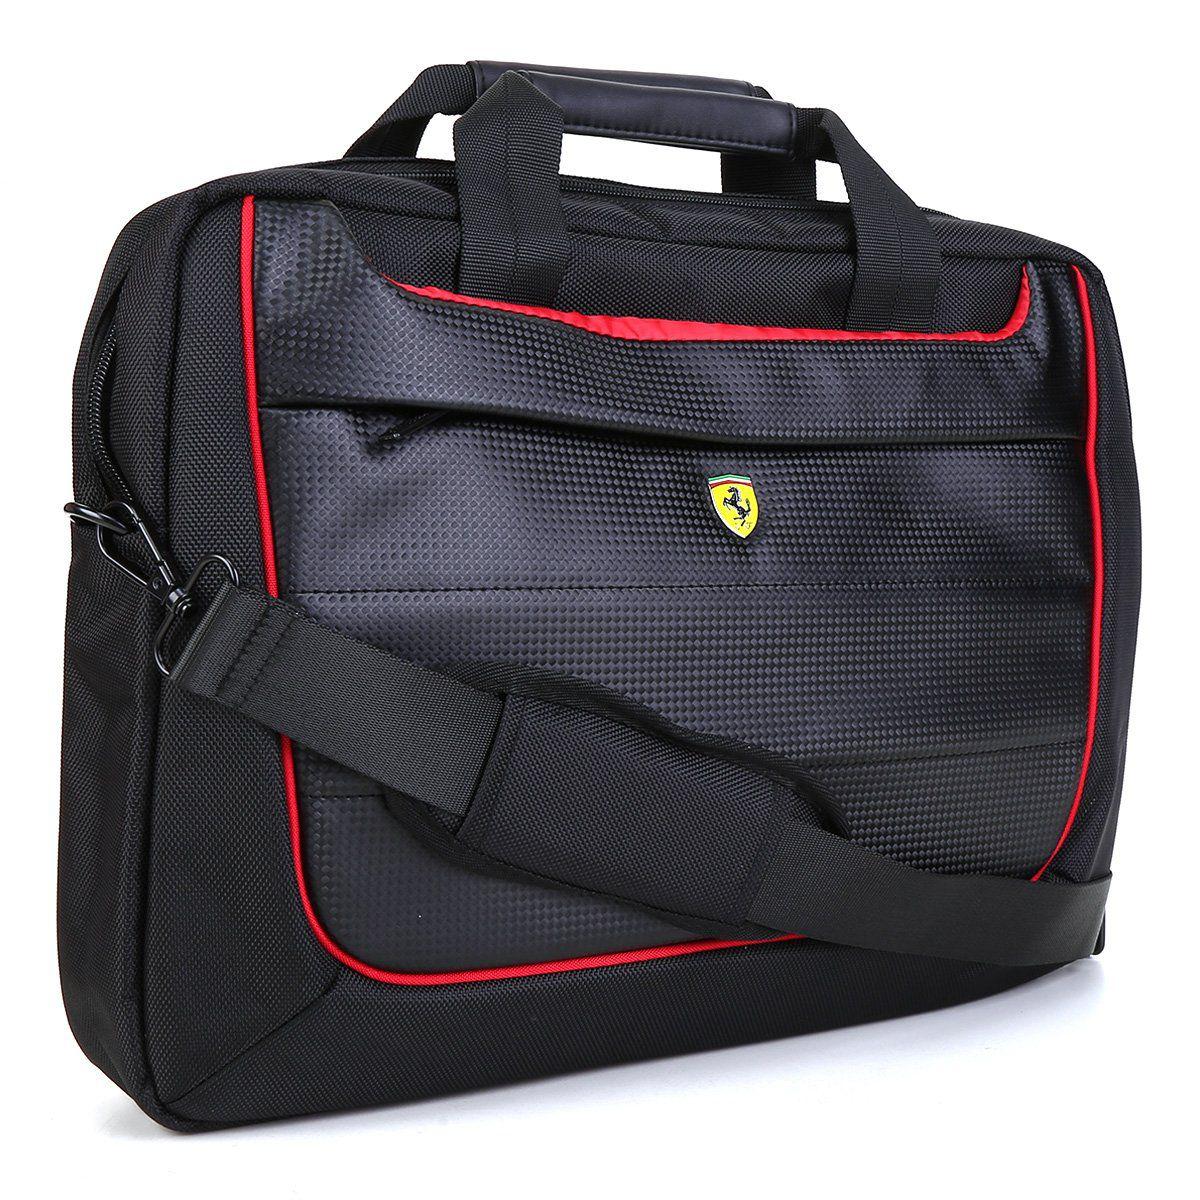 Bolsa Ferrari p/ Notebook com alça transversal